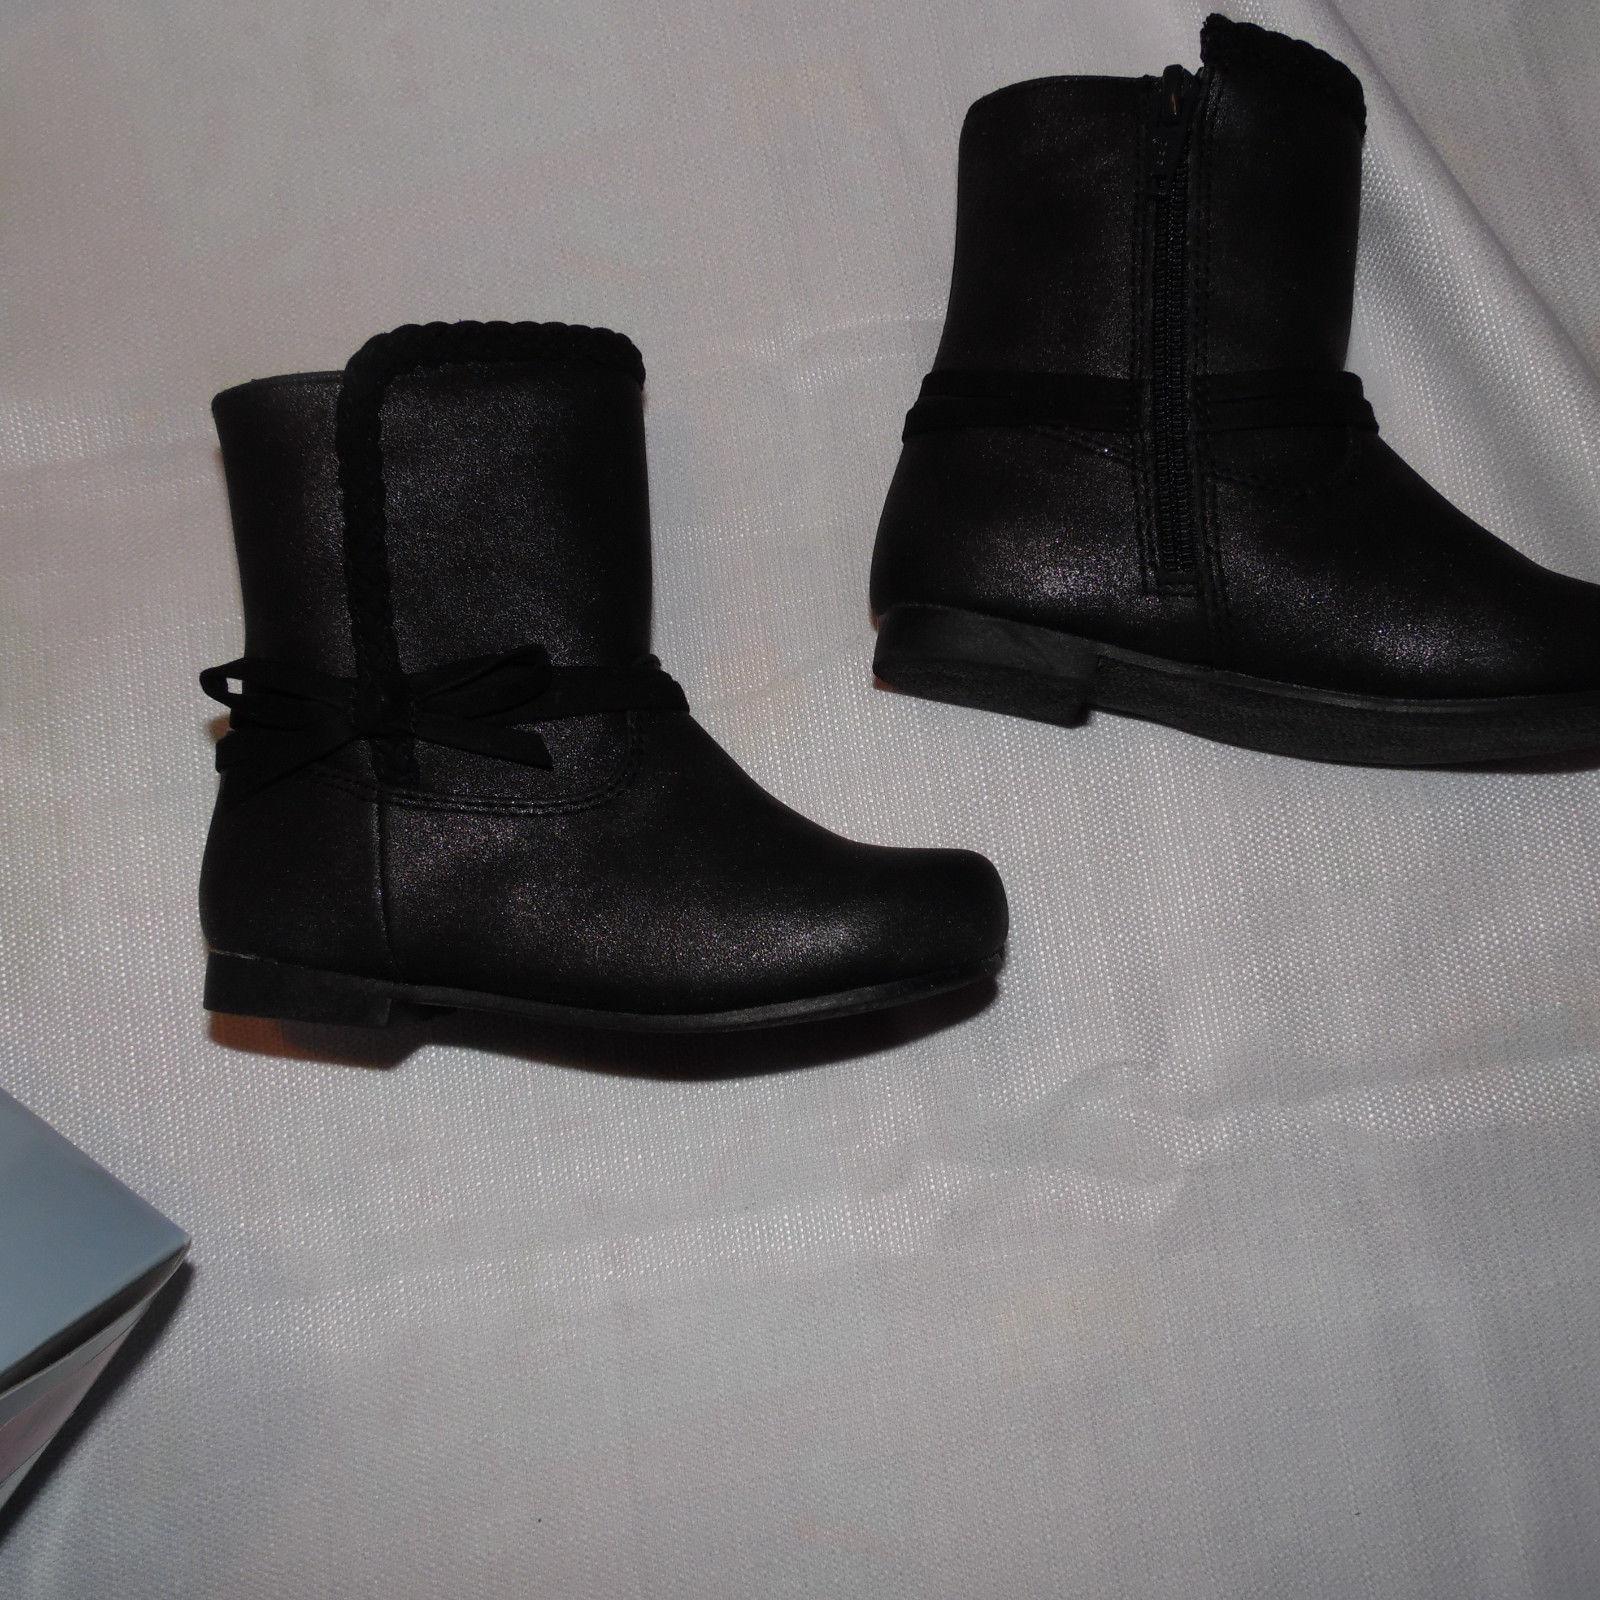 Koala Kids Toddler Girls  Black  Boots Size 8 Shoes NWT